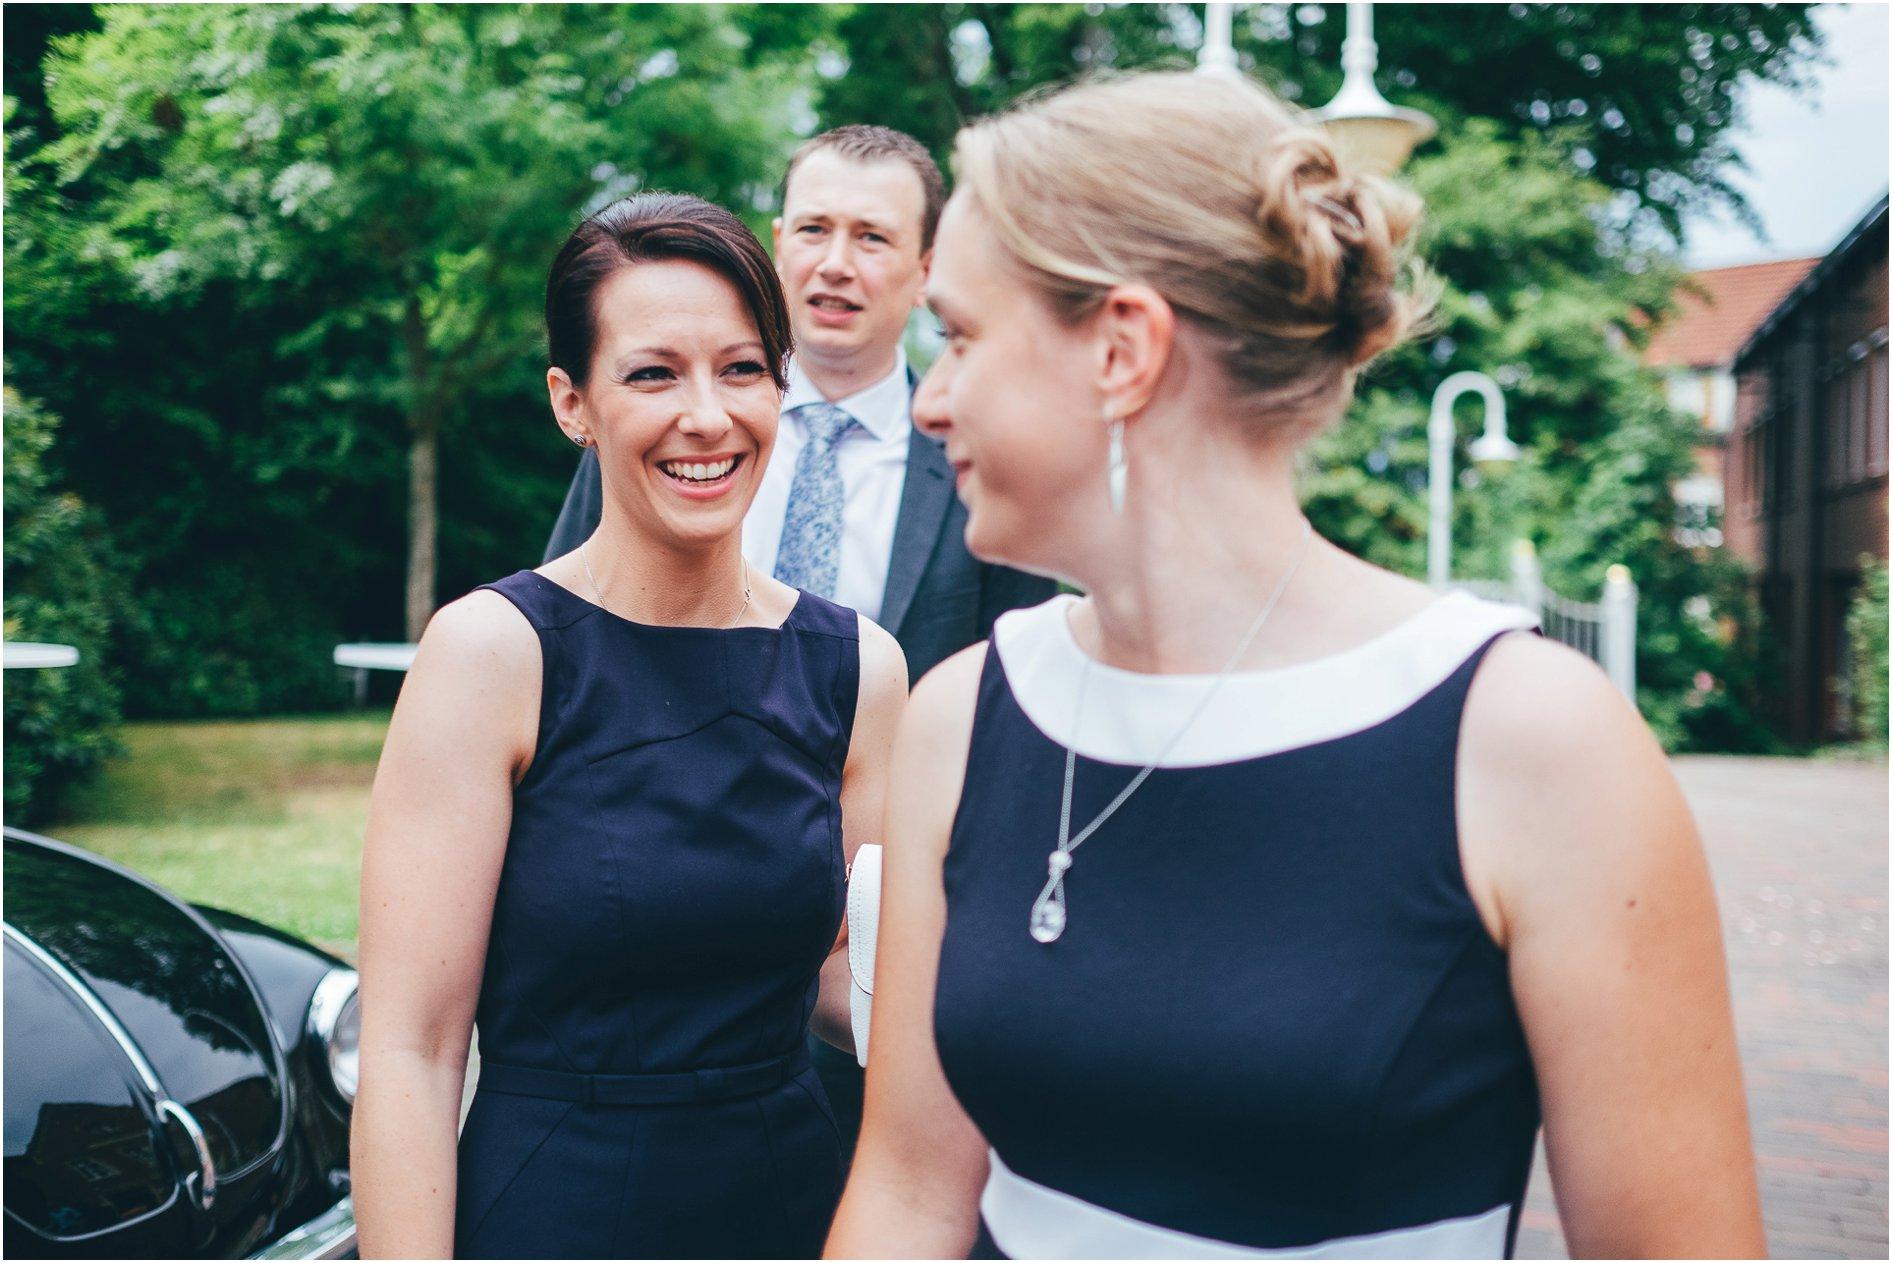 2016-04-19_0015 Sandra & Janis - Hochzeitsfotograf in Seevetal